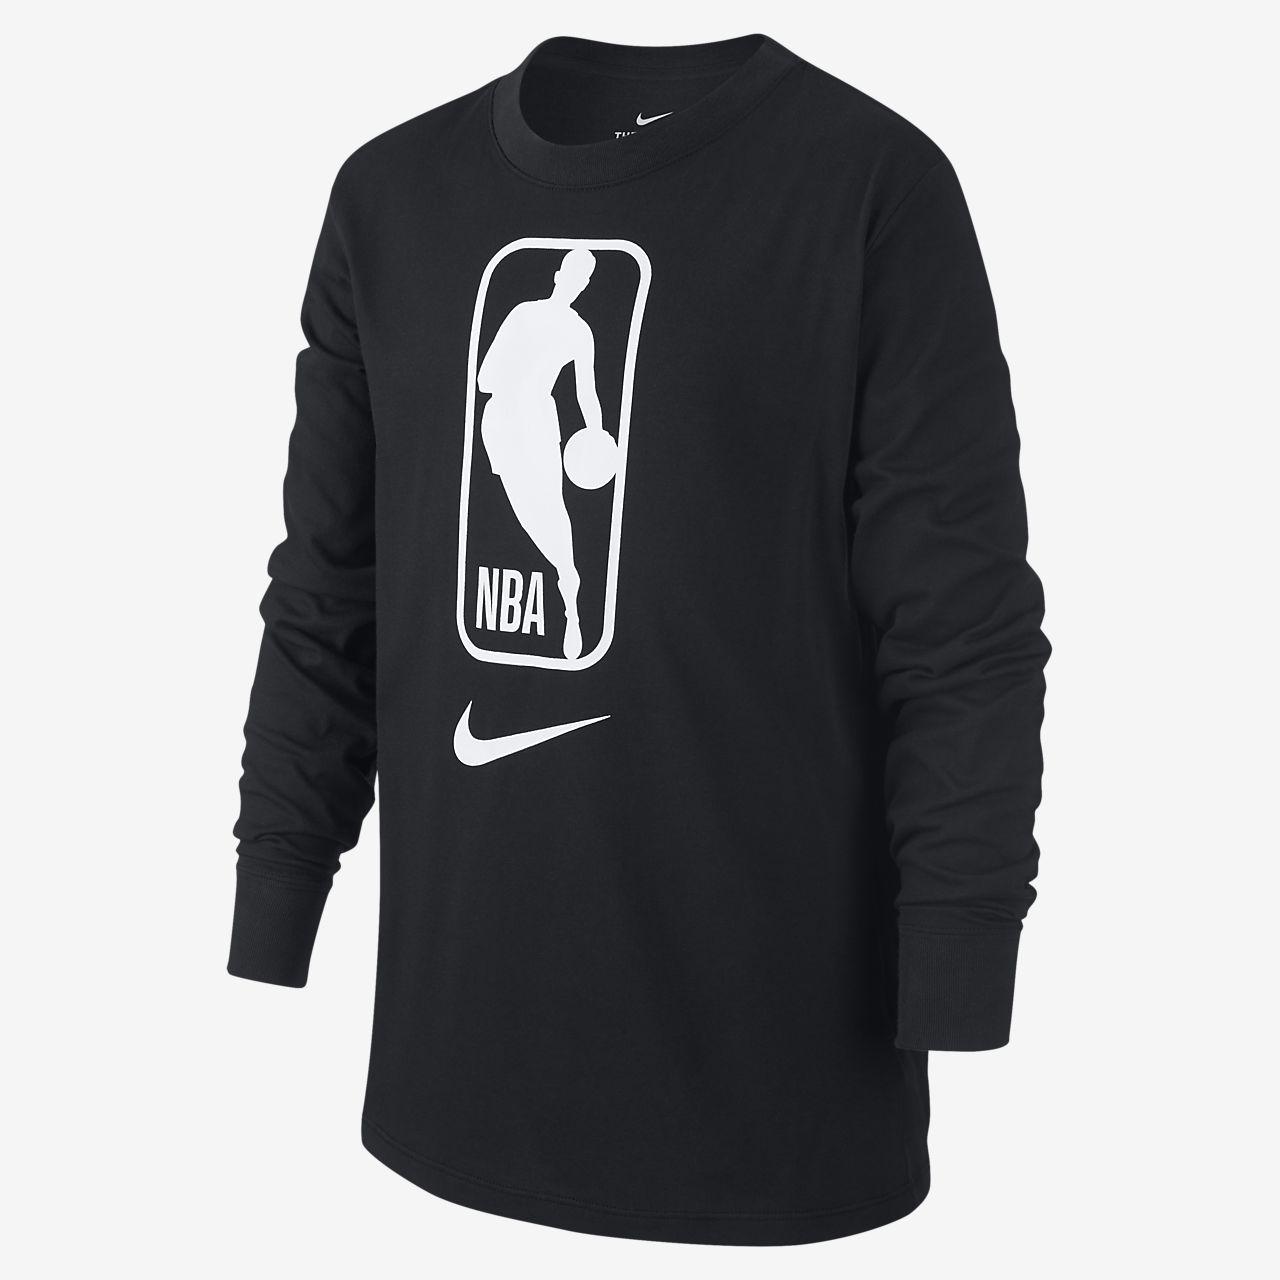 Långärmad t-shirt Nike Dri-FIT NBA för barn